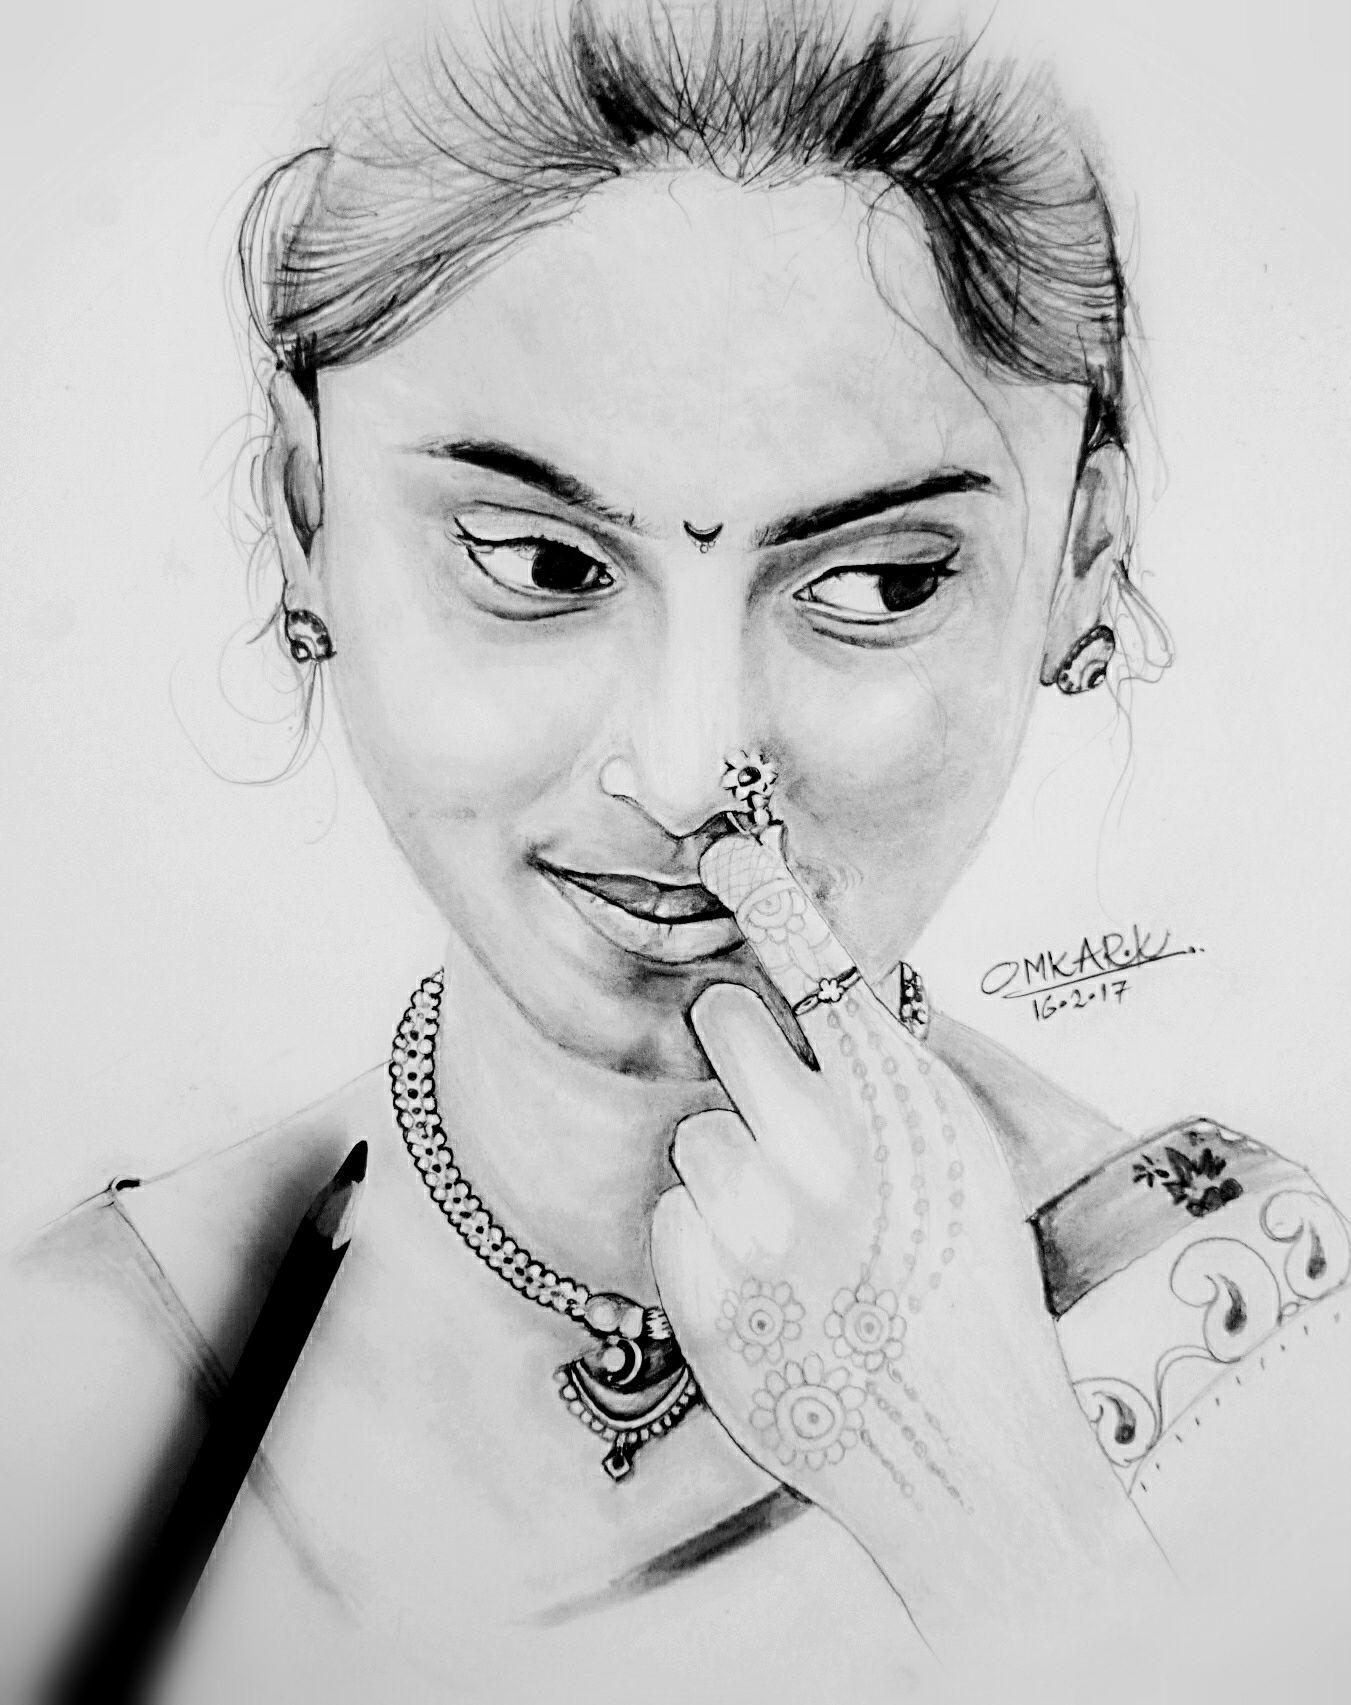 Woman Pencil Sketch : woman, pencil, sketch, Pencil, Sketch, Omkar, Khochare, Drawing,, Drawings,, Woman